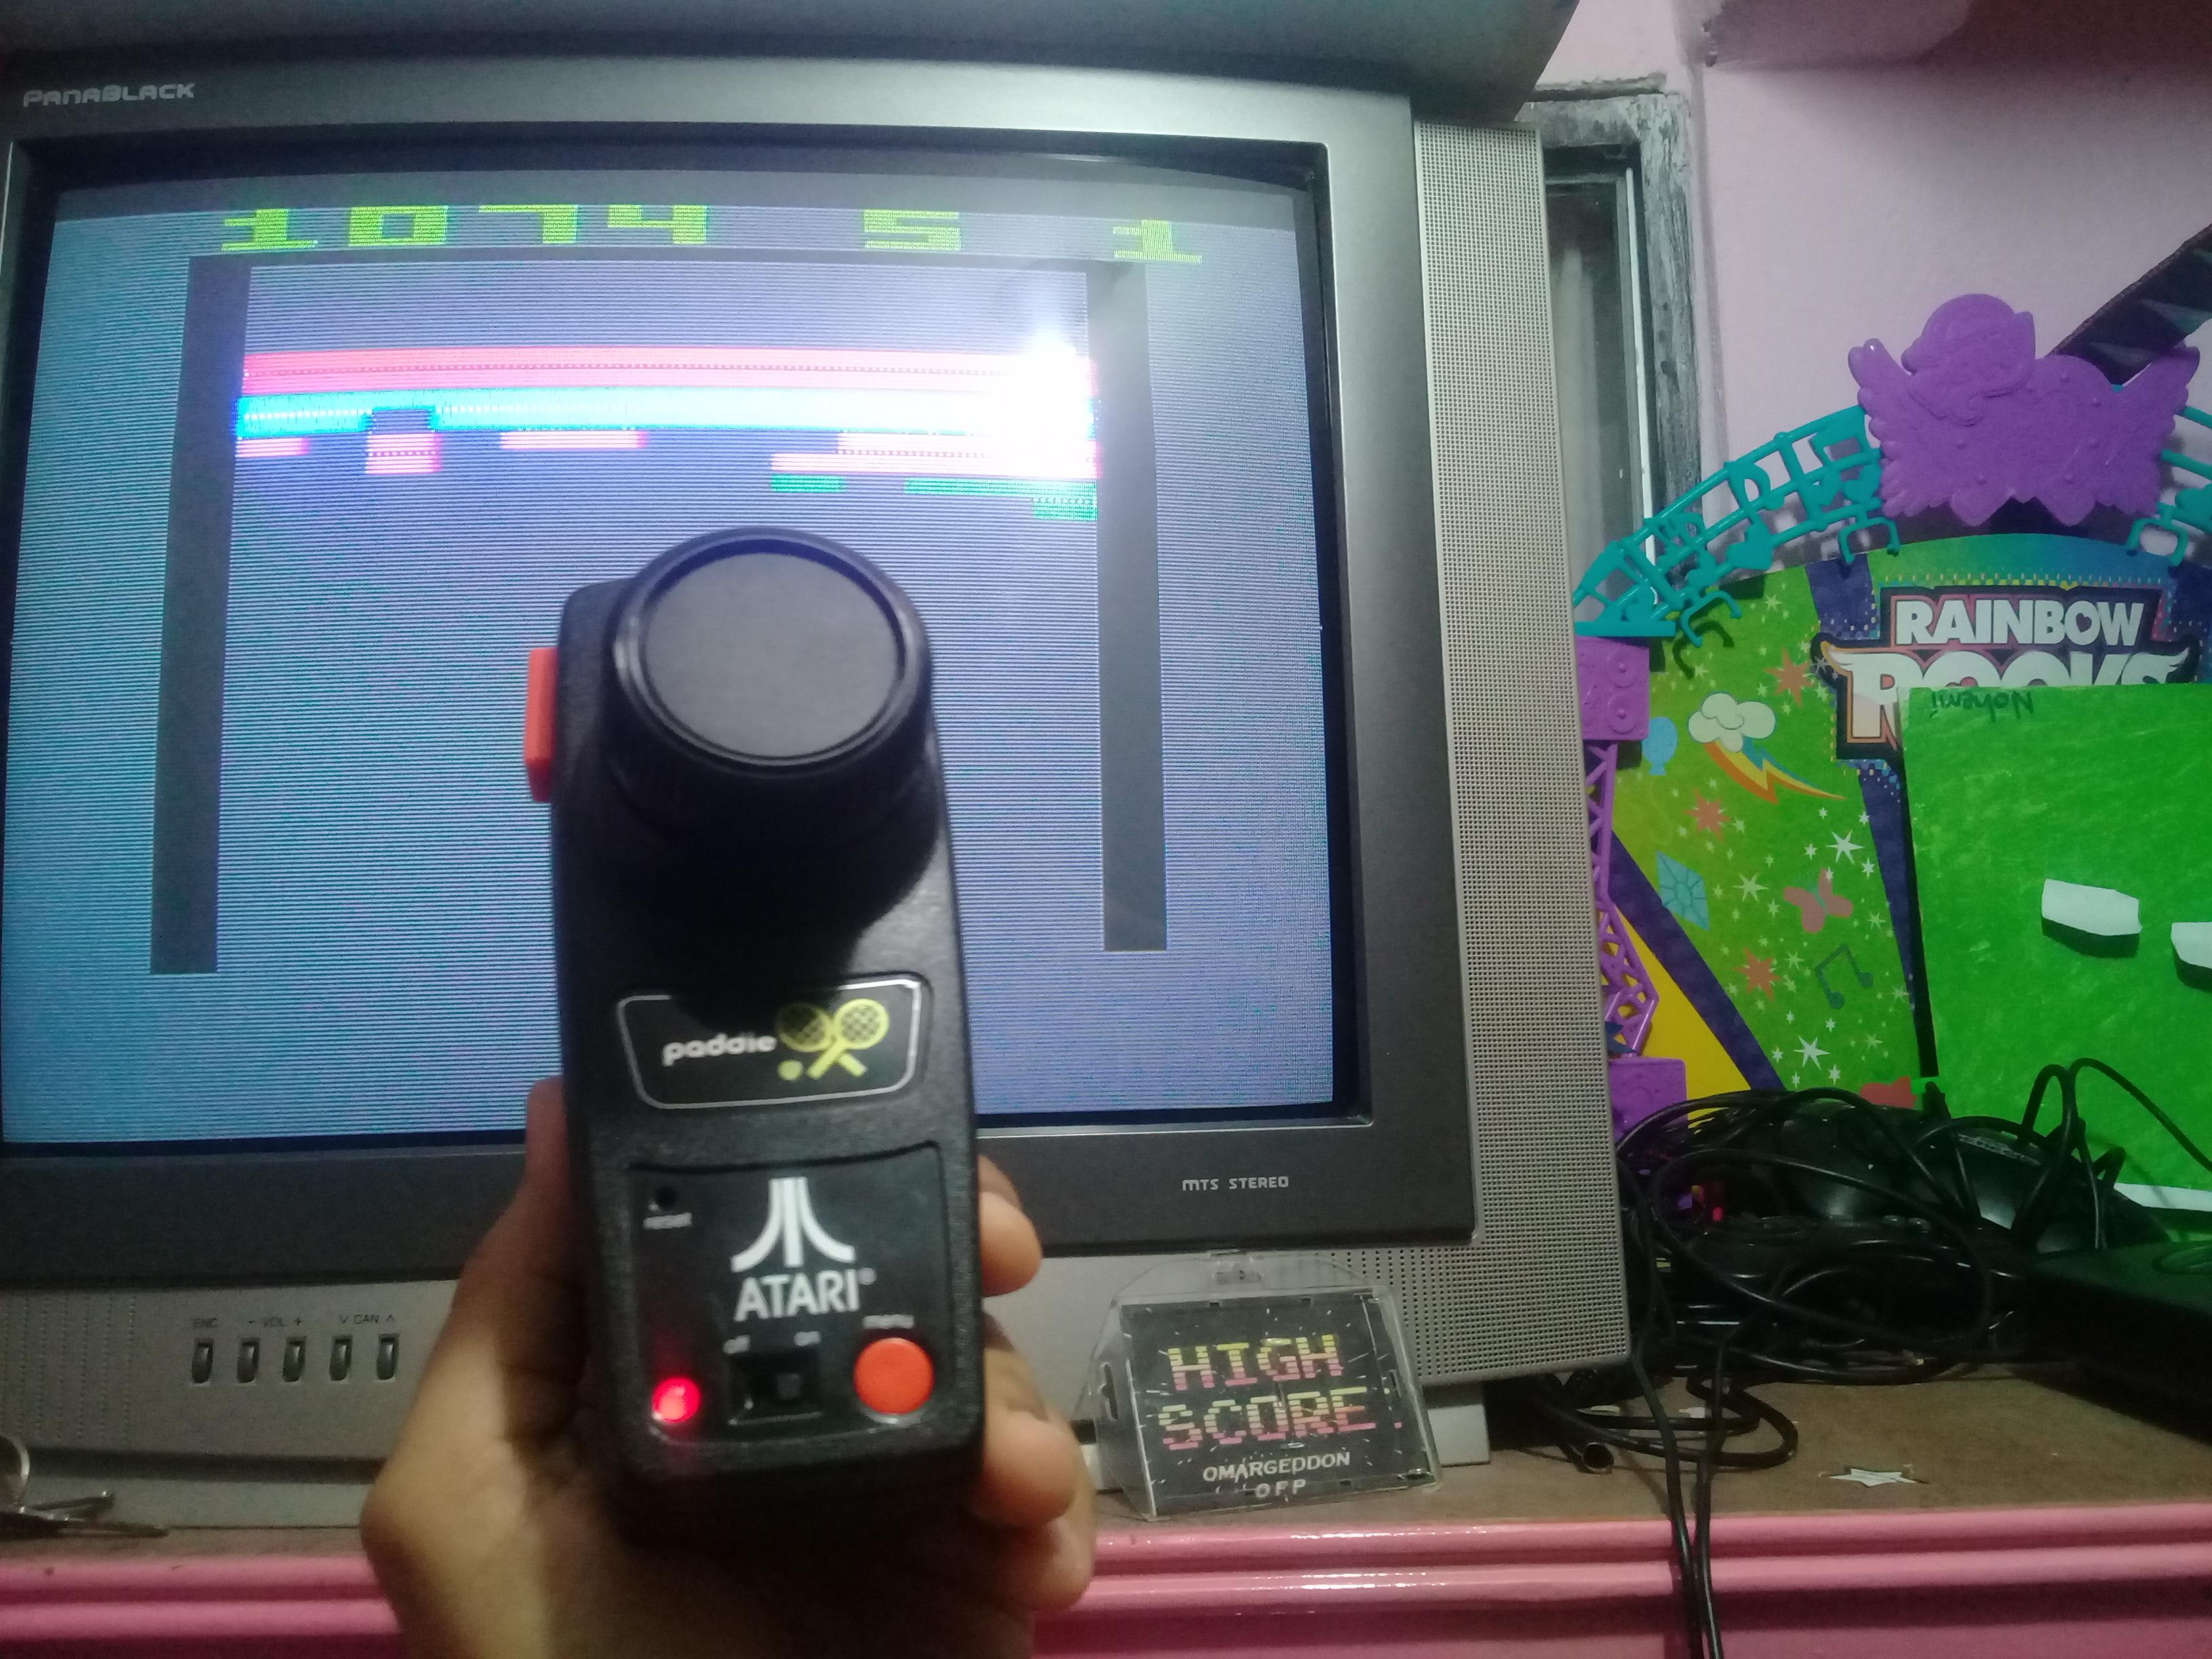 omargeddon: Super Breakout: Game 3 (Jakks Pacific Atari TV Paddle) 1,074 points on 2019-01-13 19:17:27